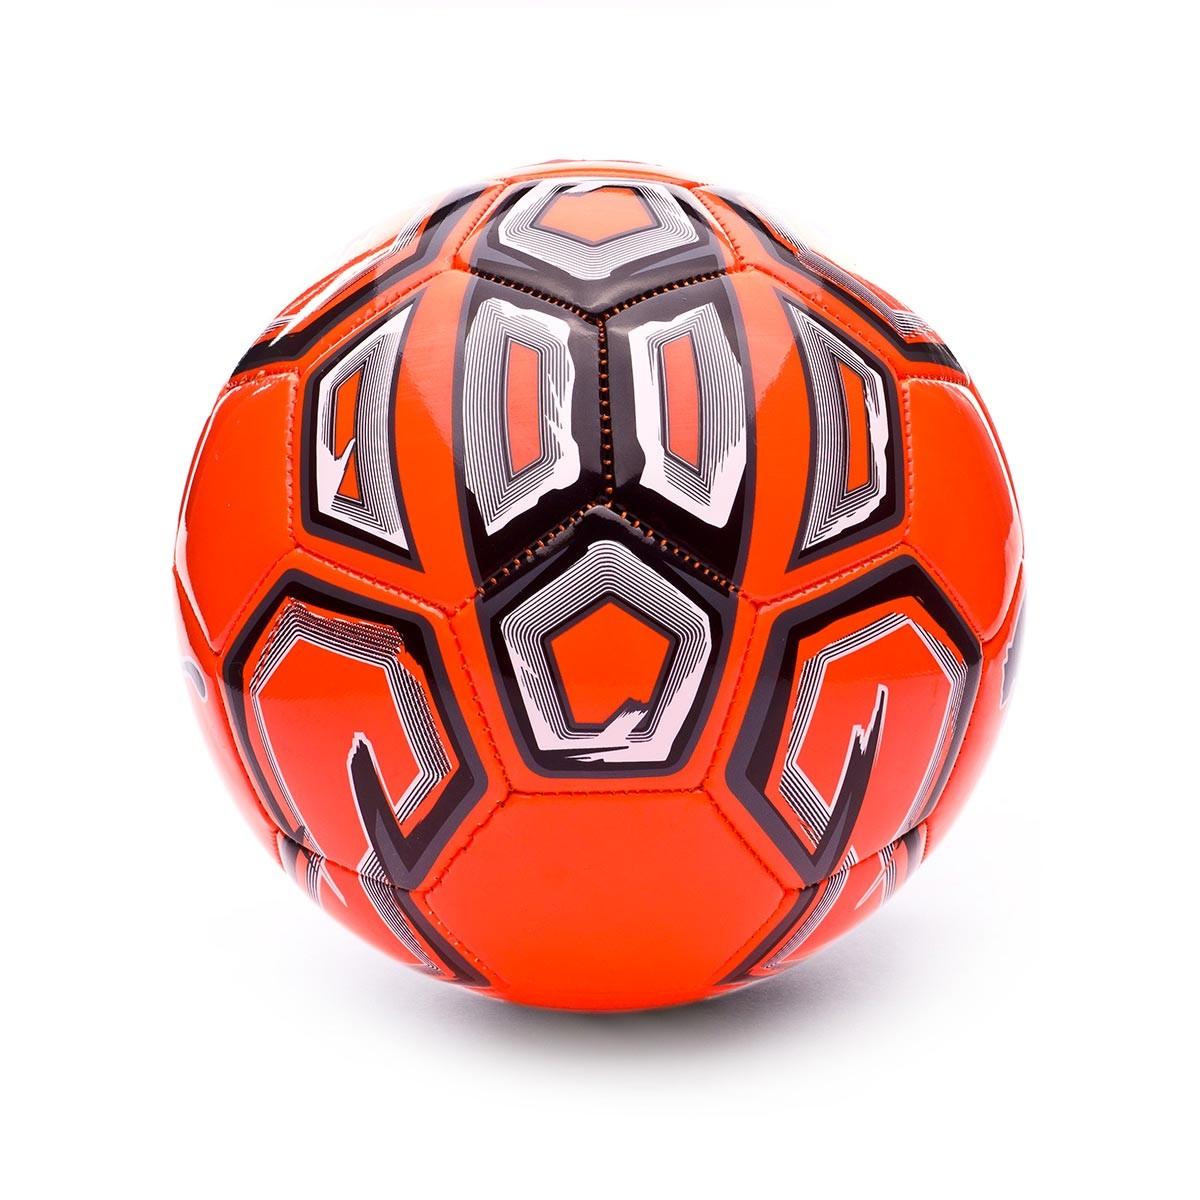 2c3d40501d887 Balón Puma Futsal 1 Trainer MS Shocking orange-Puma black-Puma white -  Tienda de fútbol Fútbol Emotion